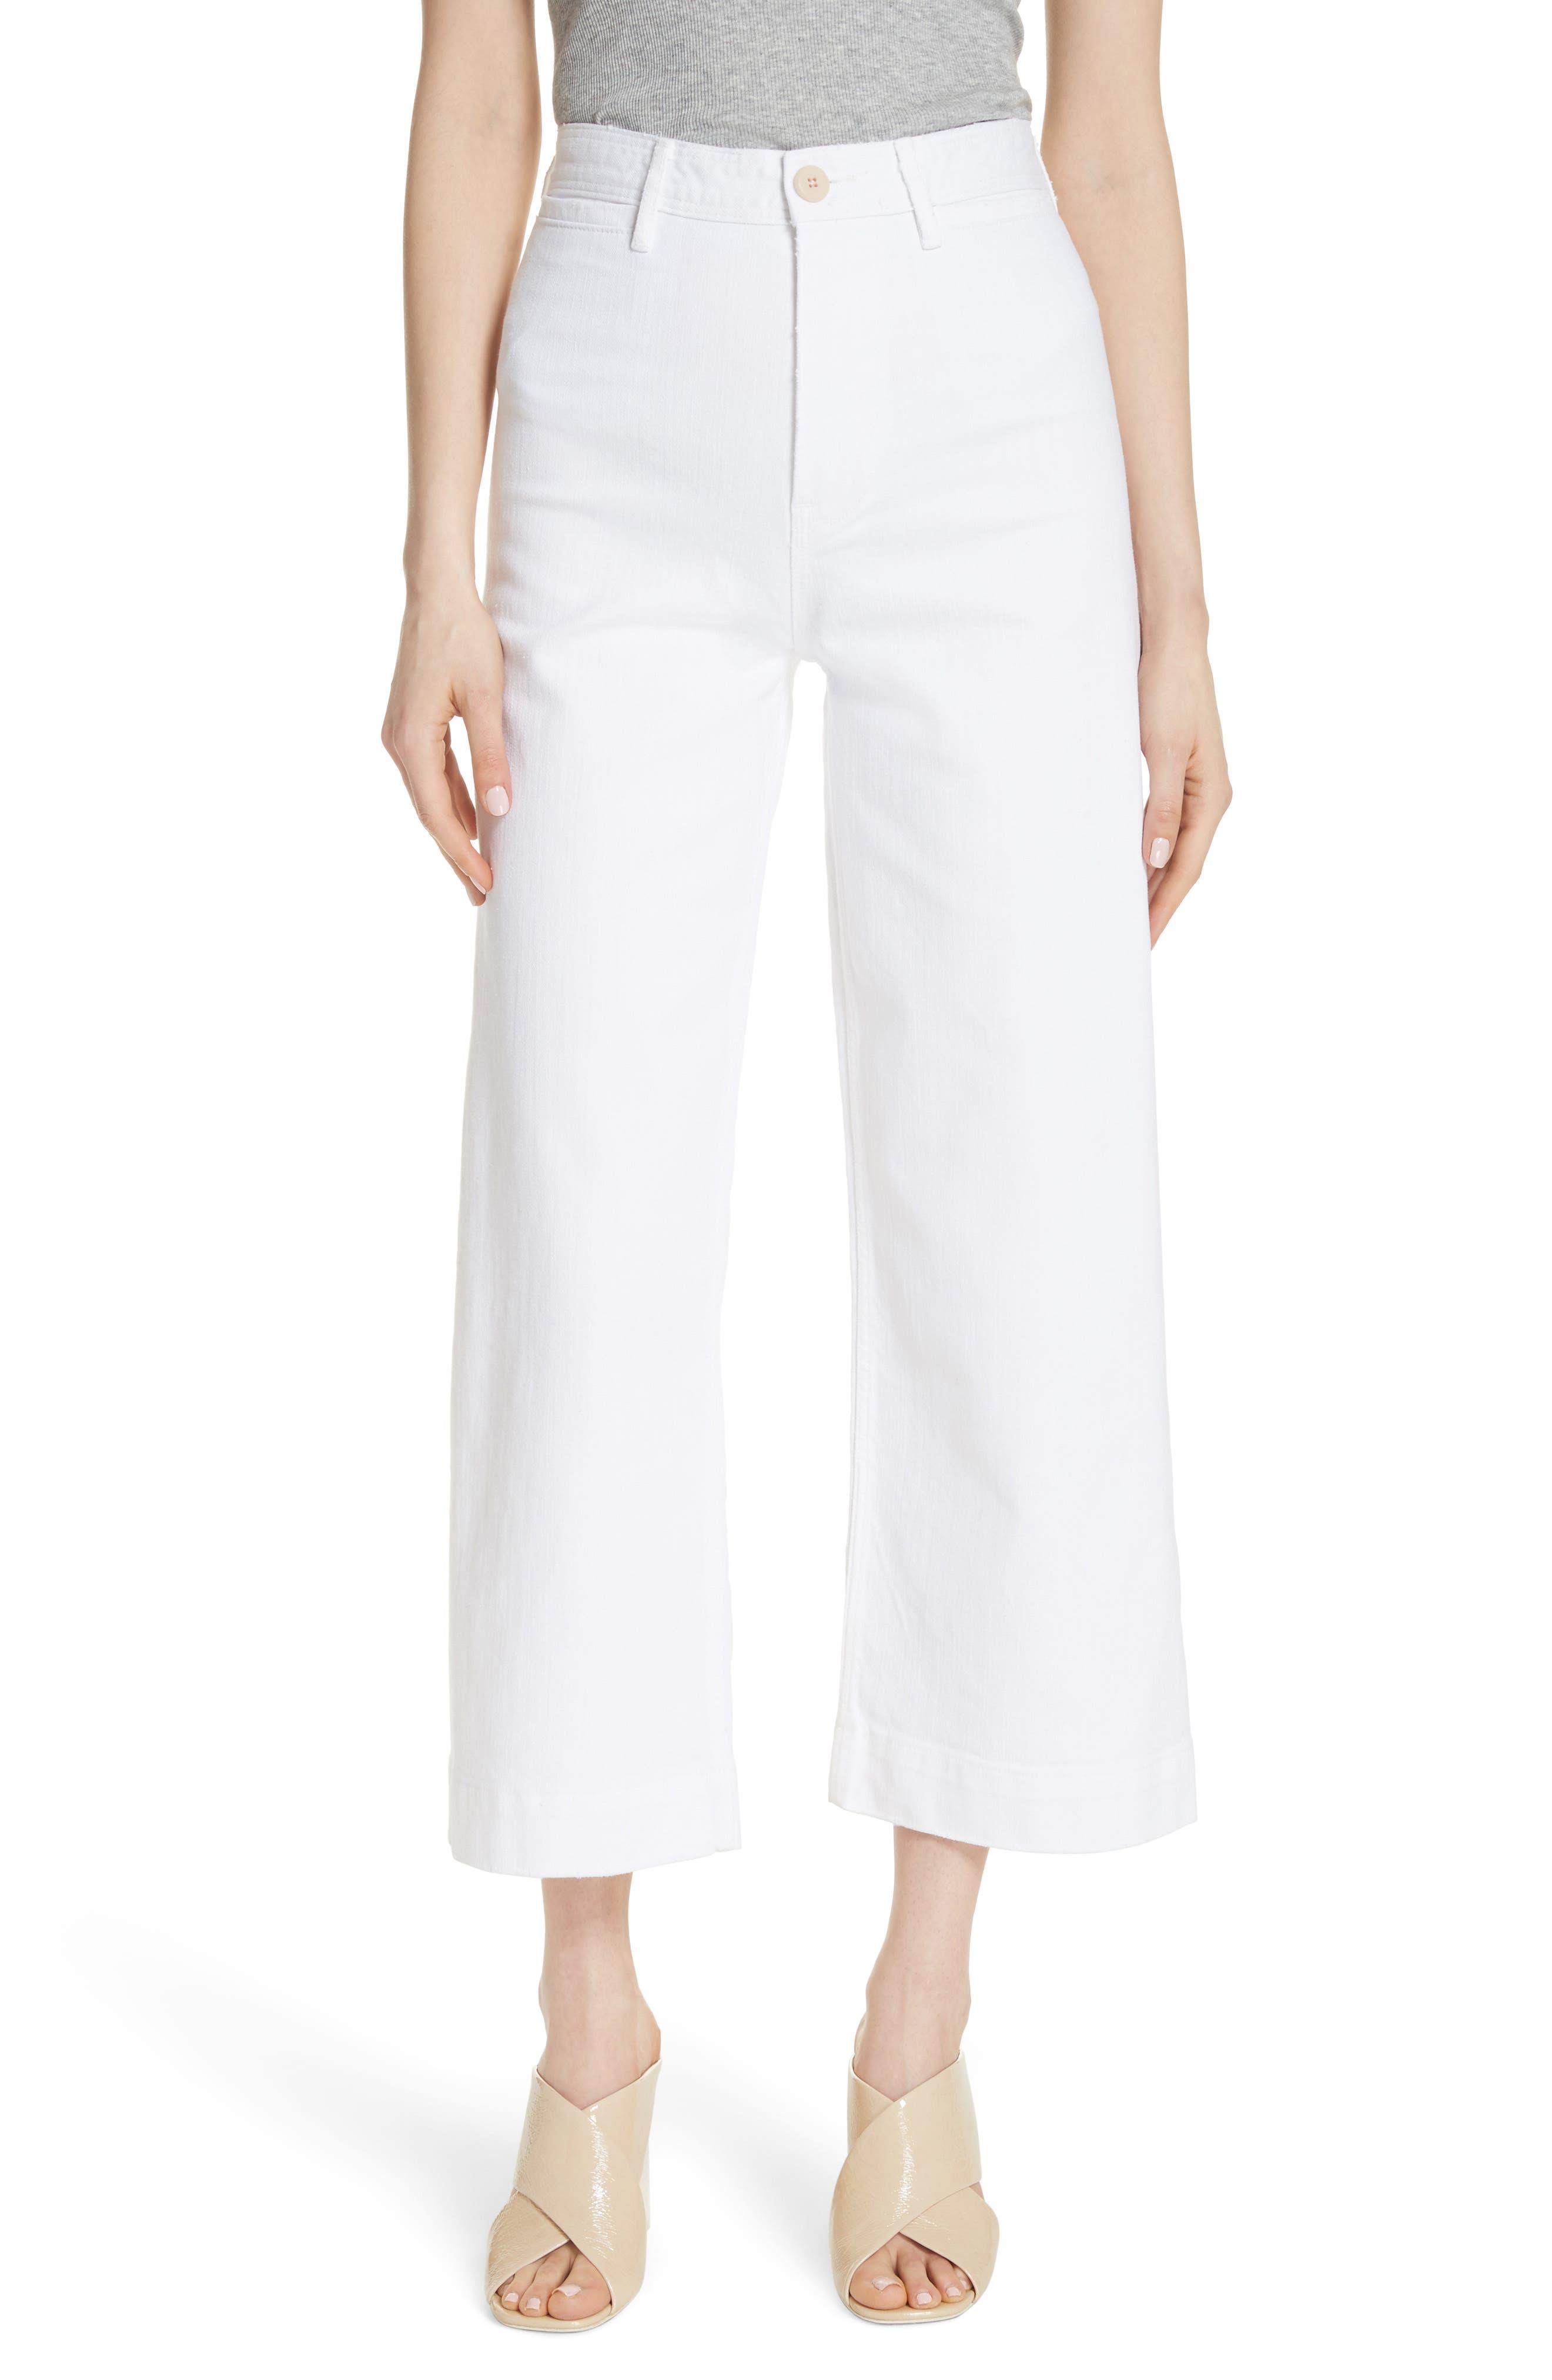 La Vie Rebecca Taylor Crop Jeans (Milk)